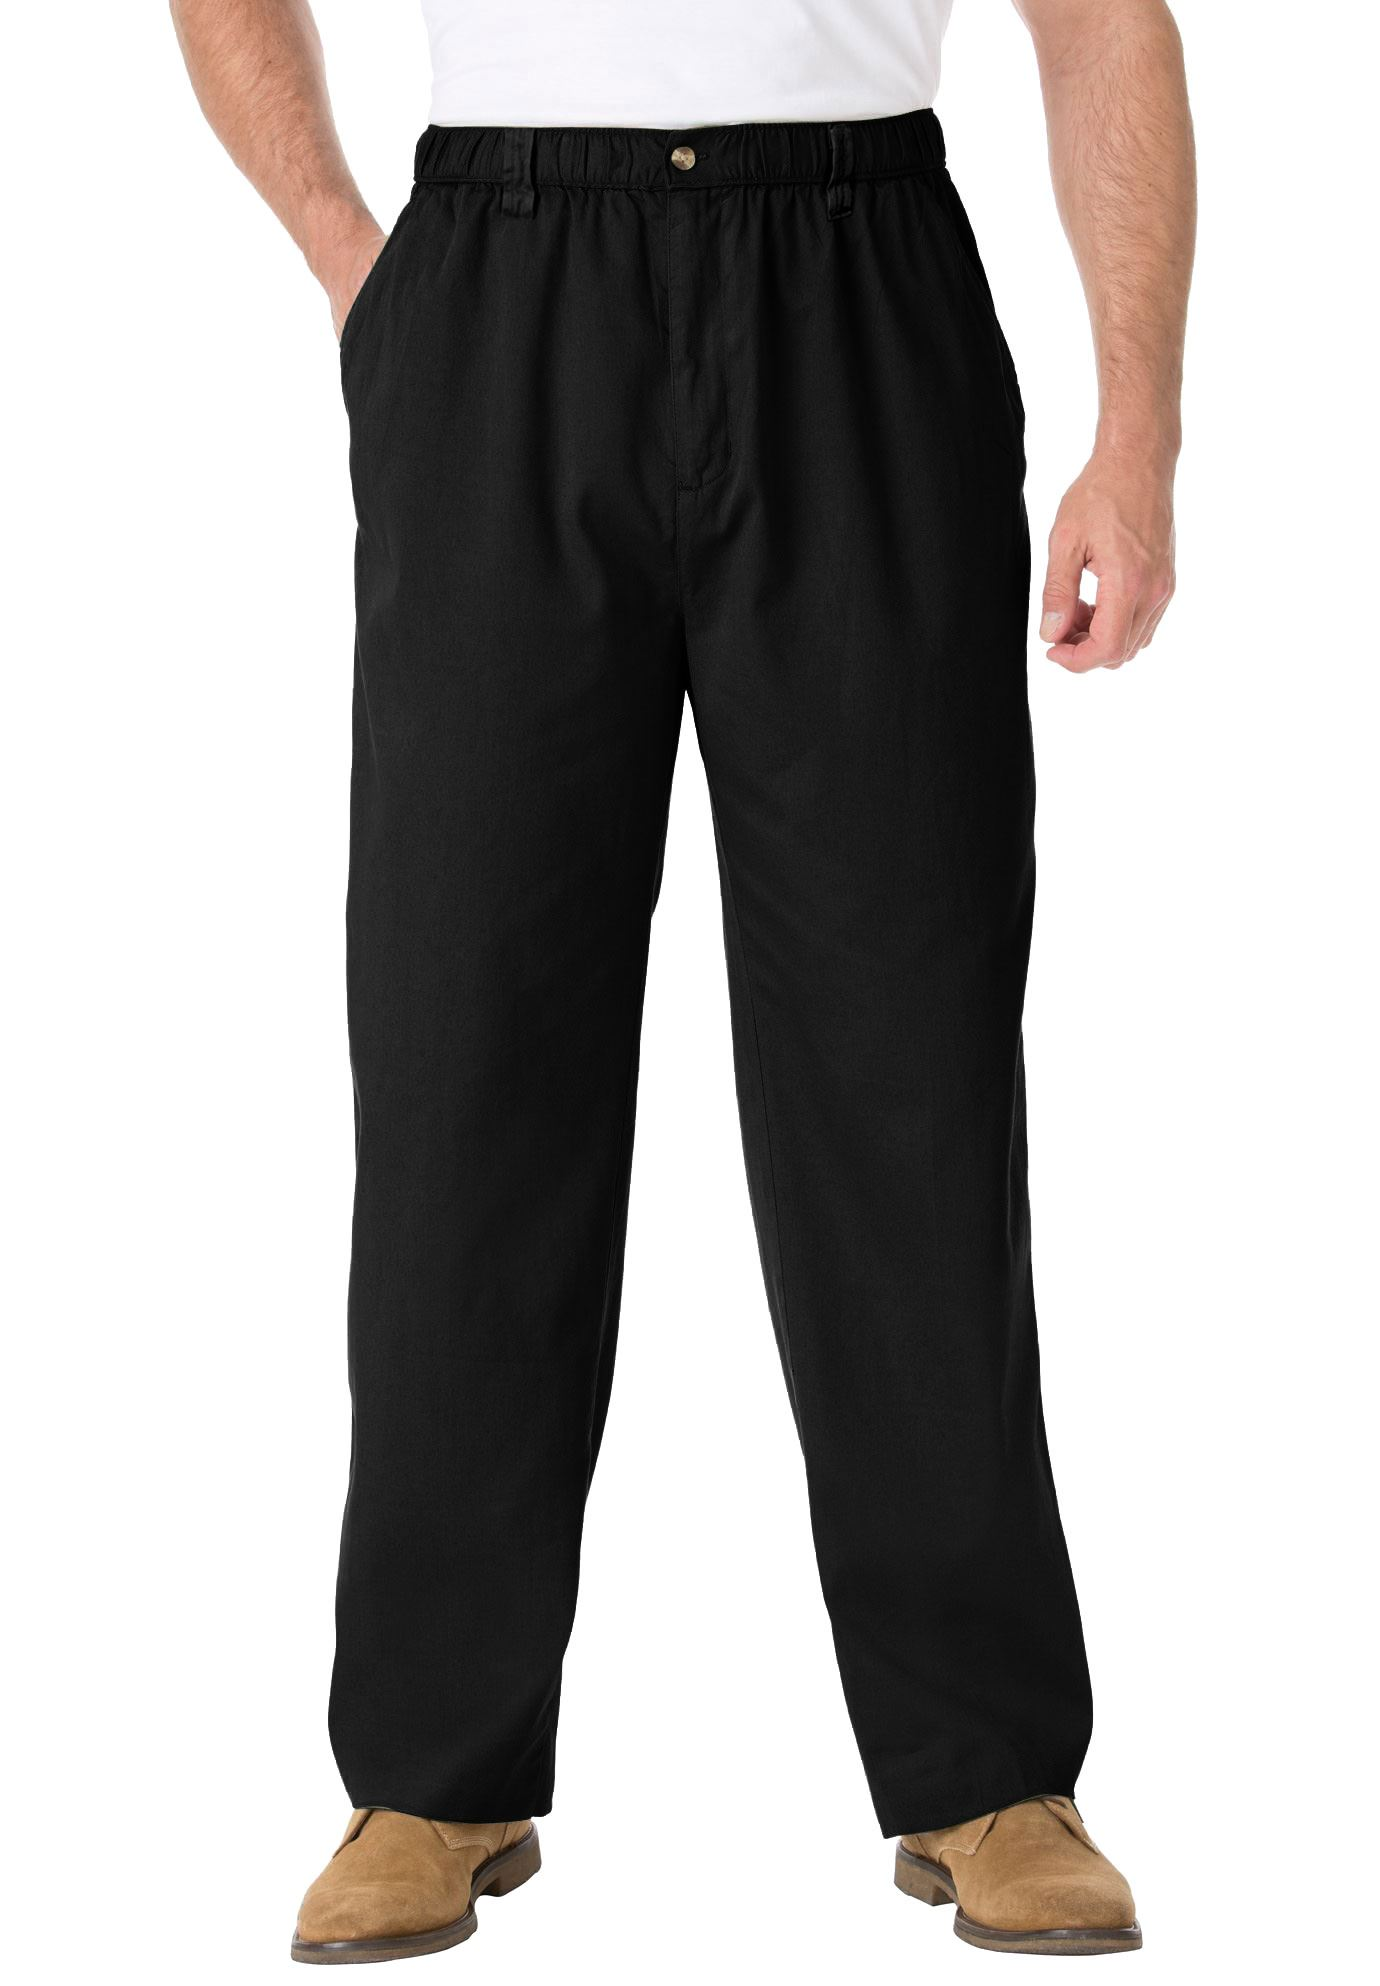 Kingsize Men's Big & Tall Knockarounds Plain Front Pants In Twill Or Denim